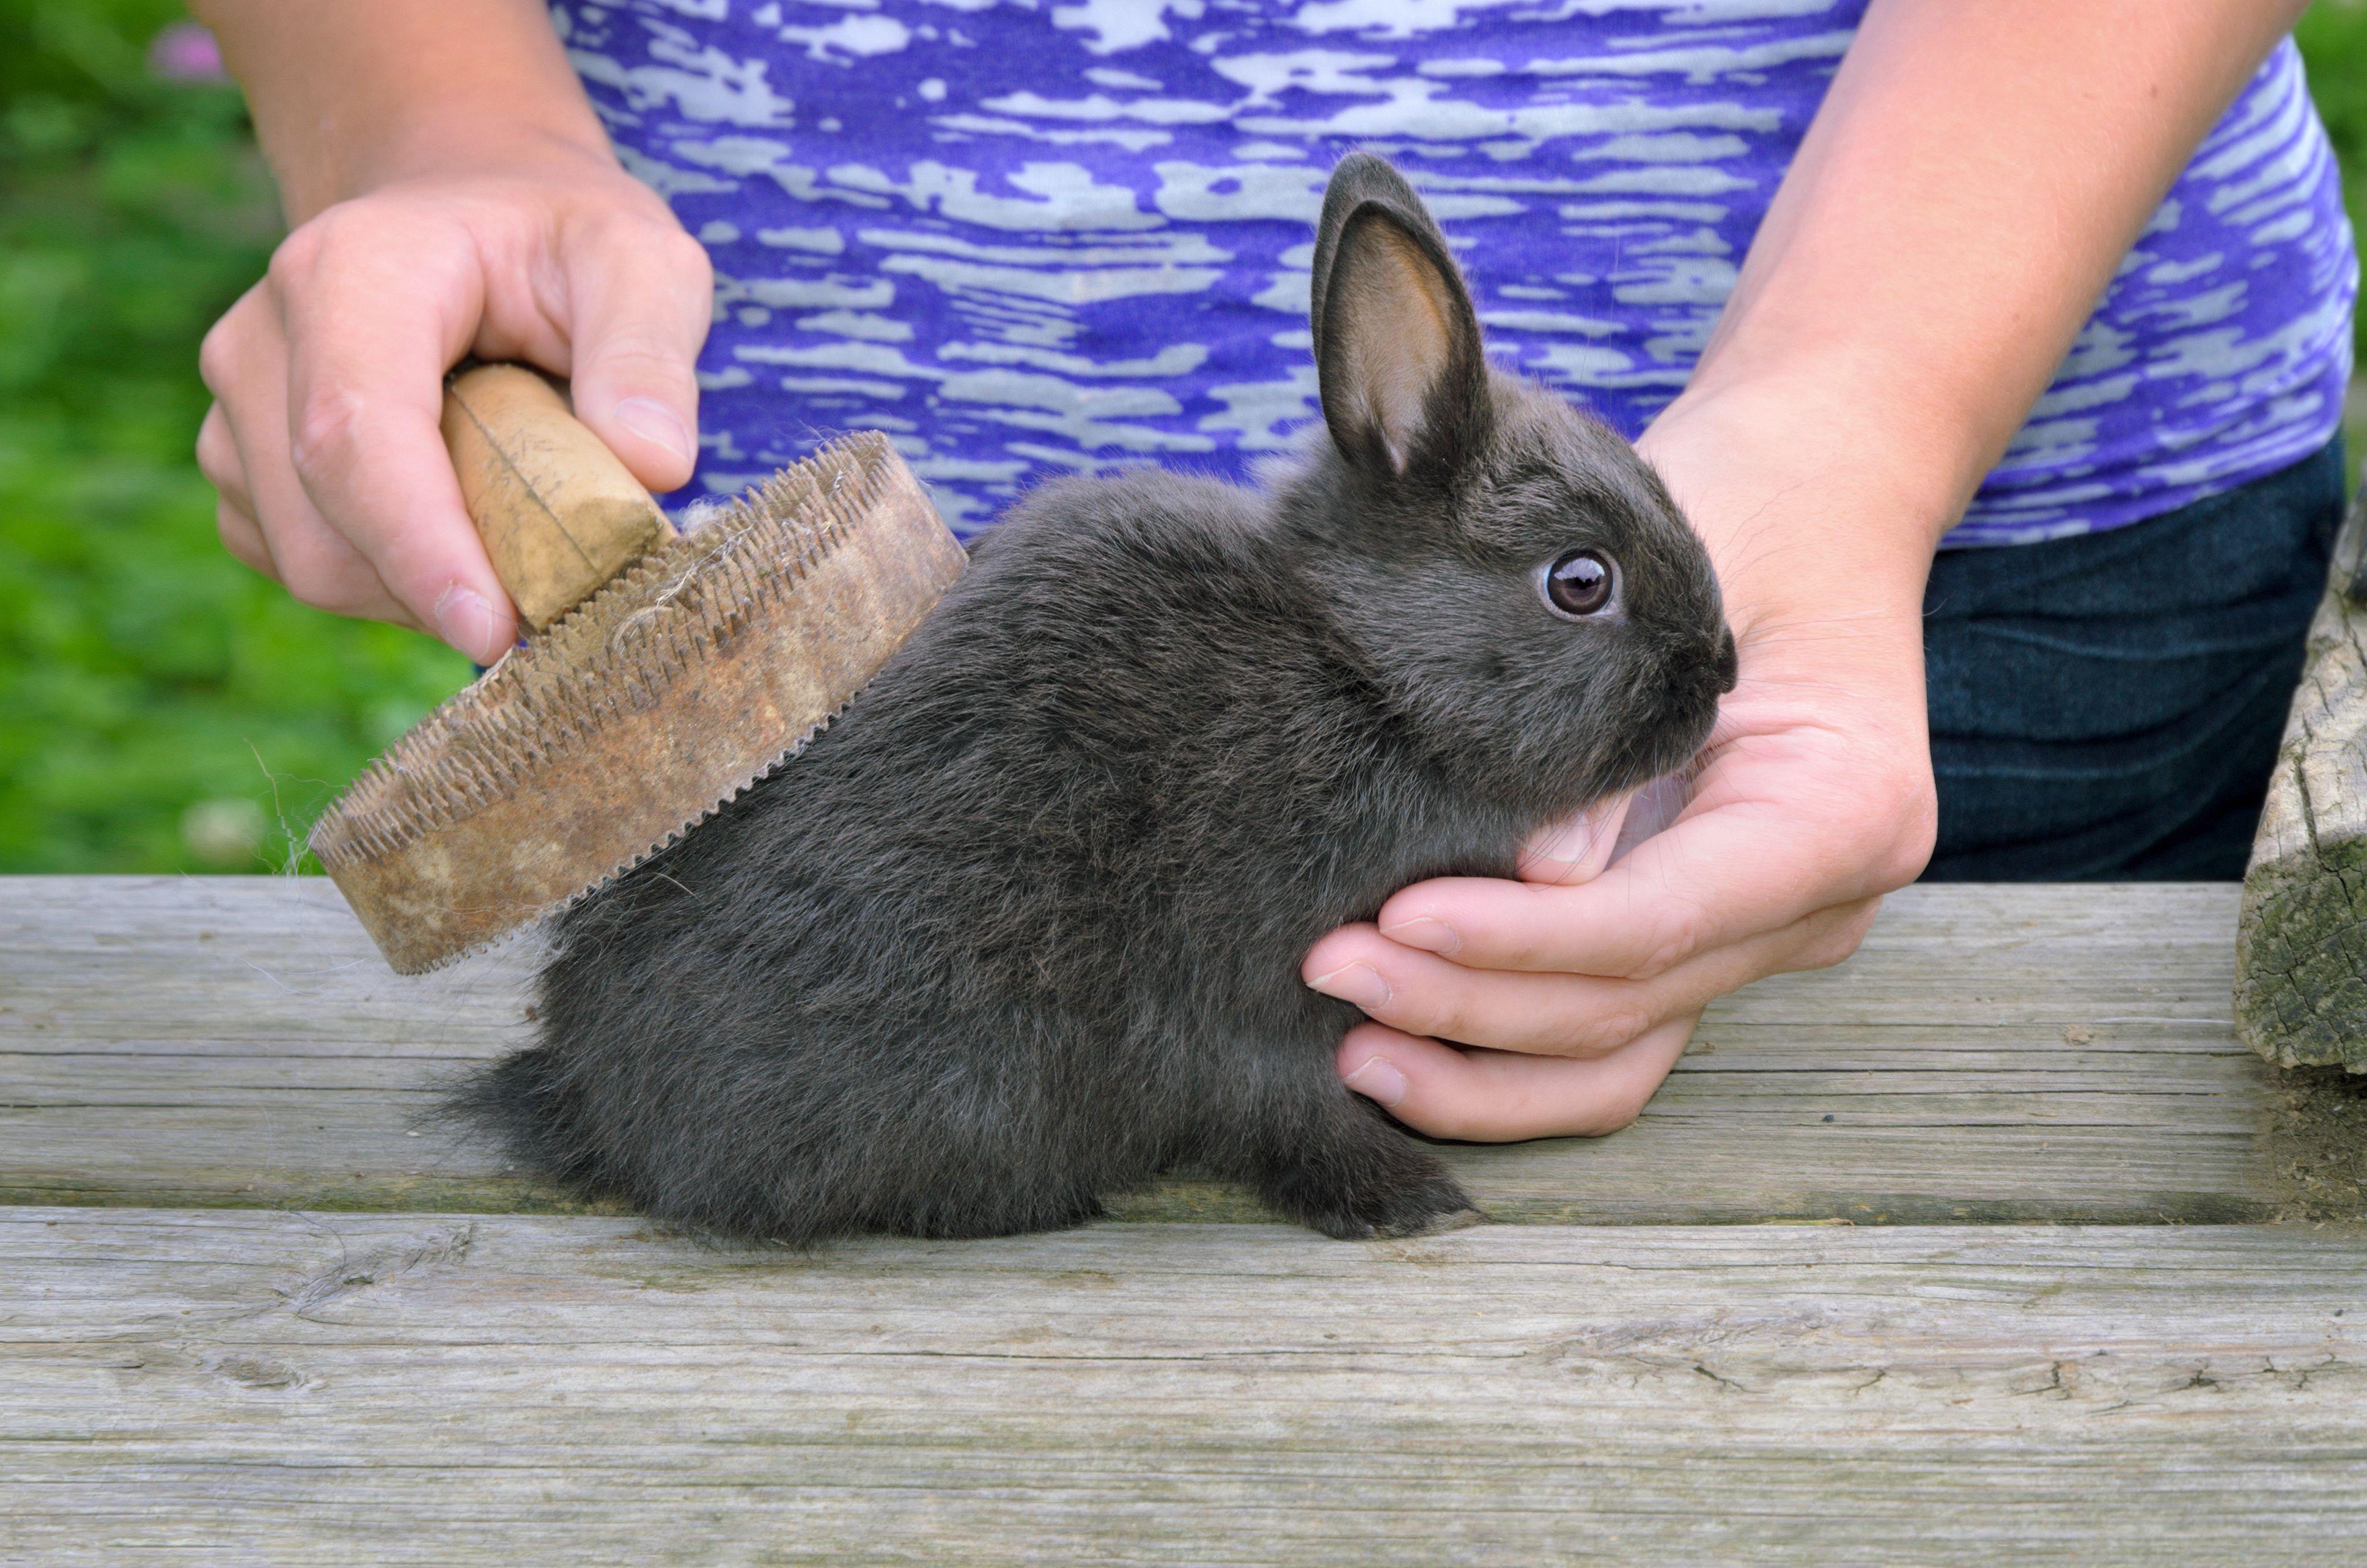 Rabbit Grooming Grooming Pet Rabbits